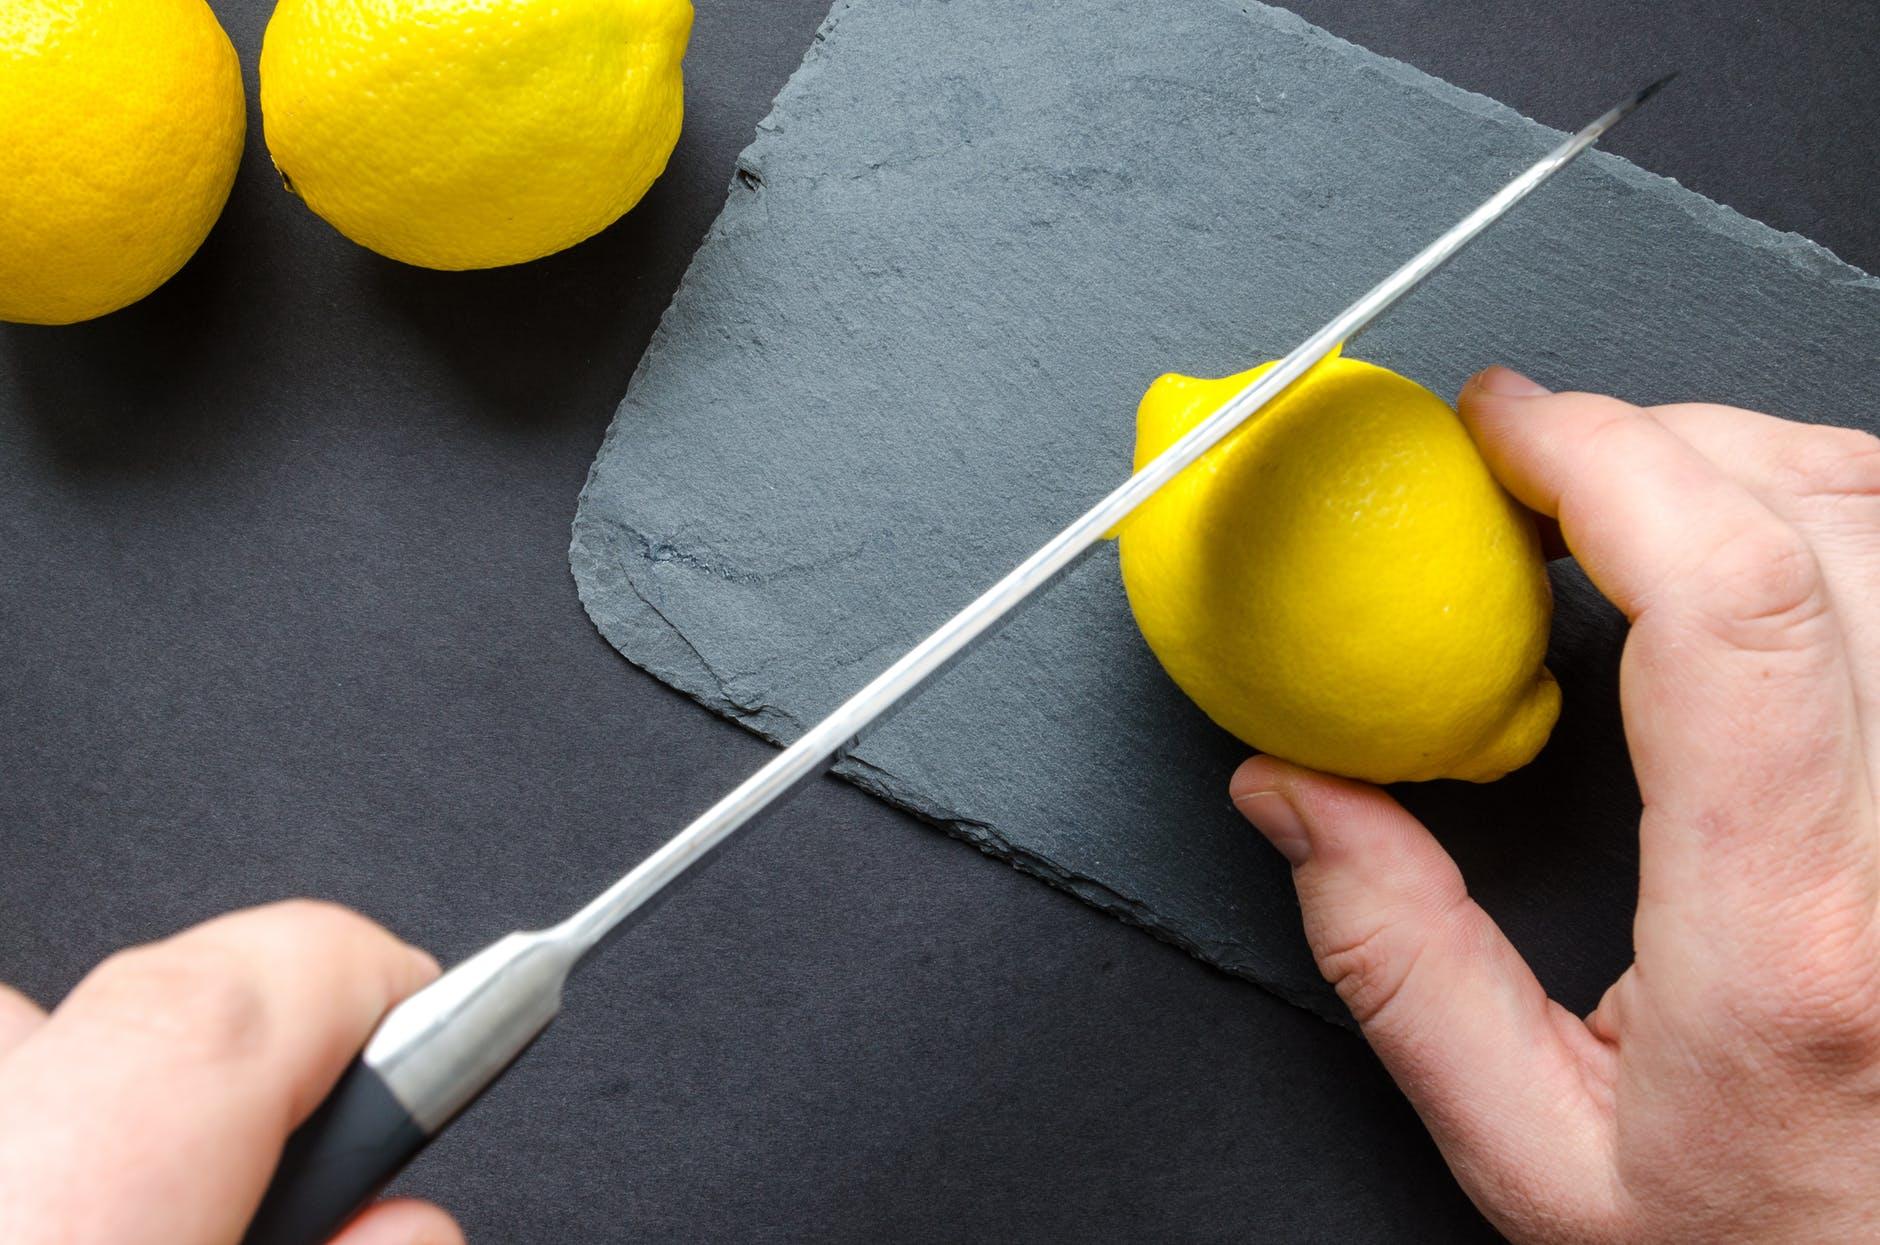 Knife in Kitchen